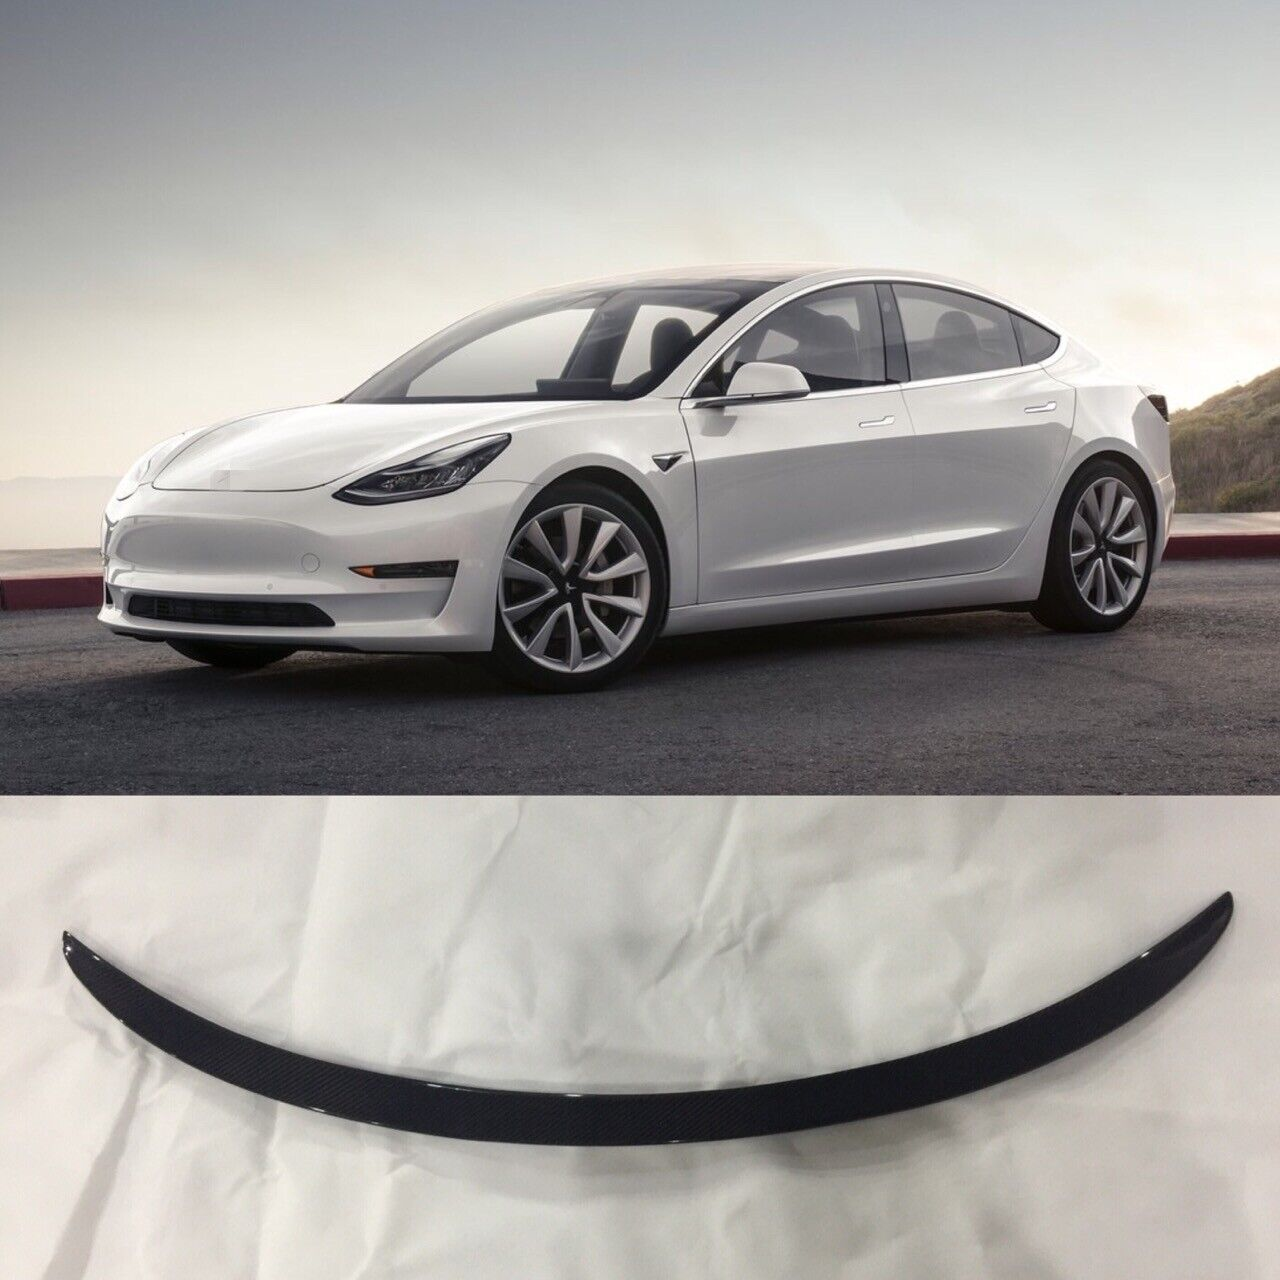 Matte Carbon Fiber Fits 17-19 Tesla Model 3 IKON Style Trunk Spoiler Wing